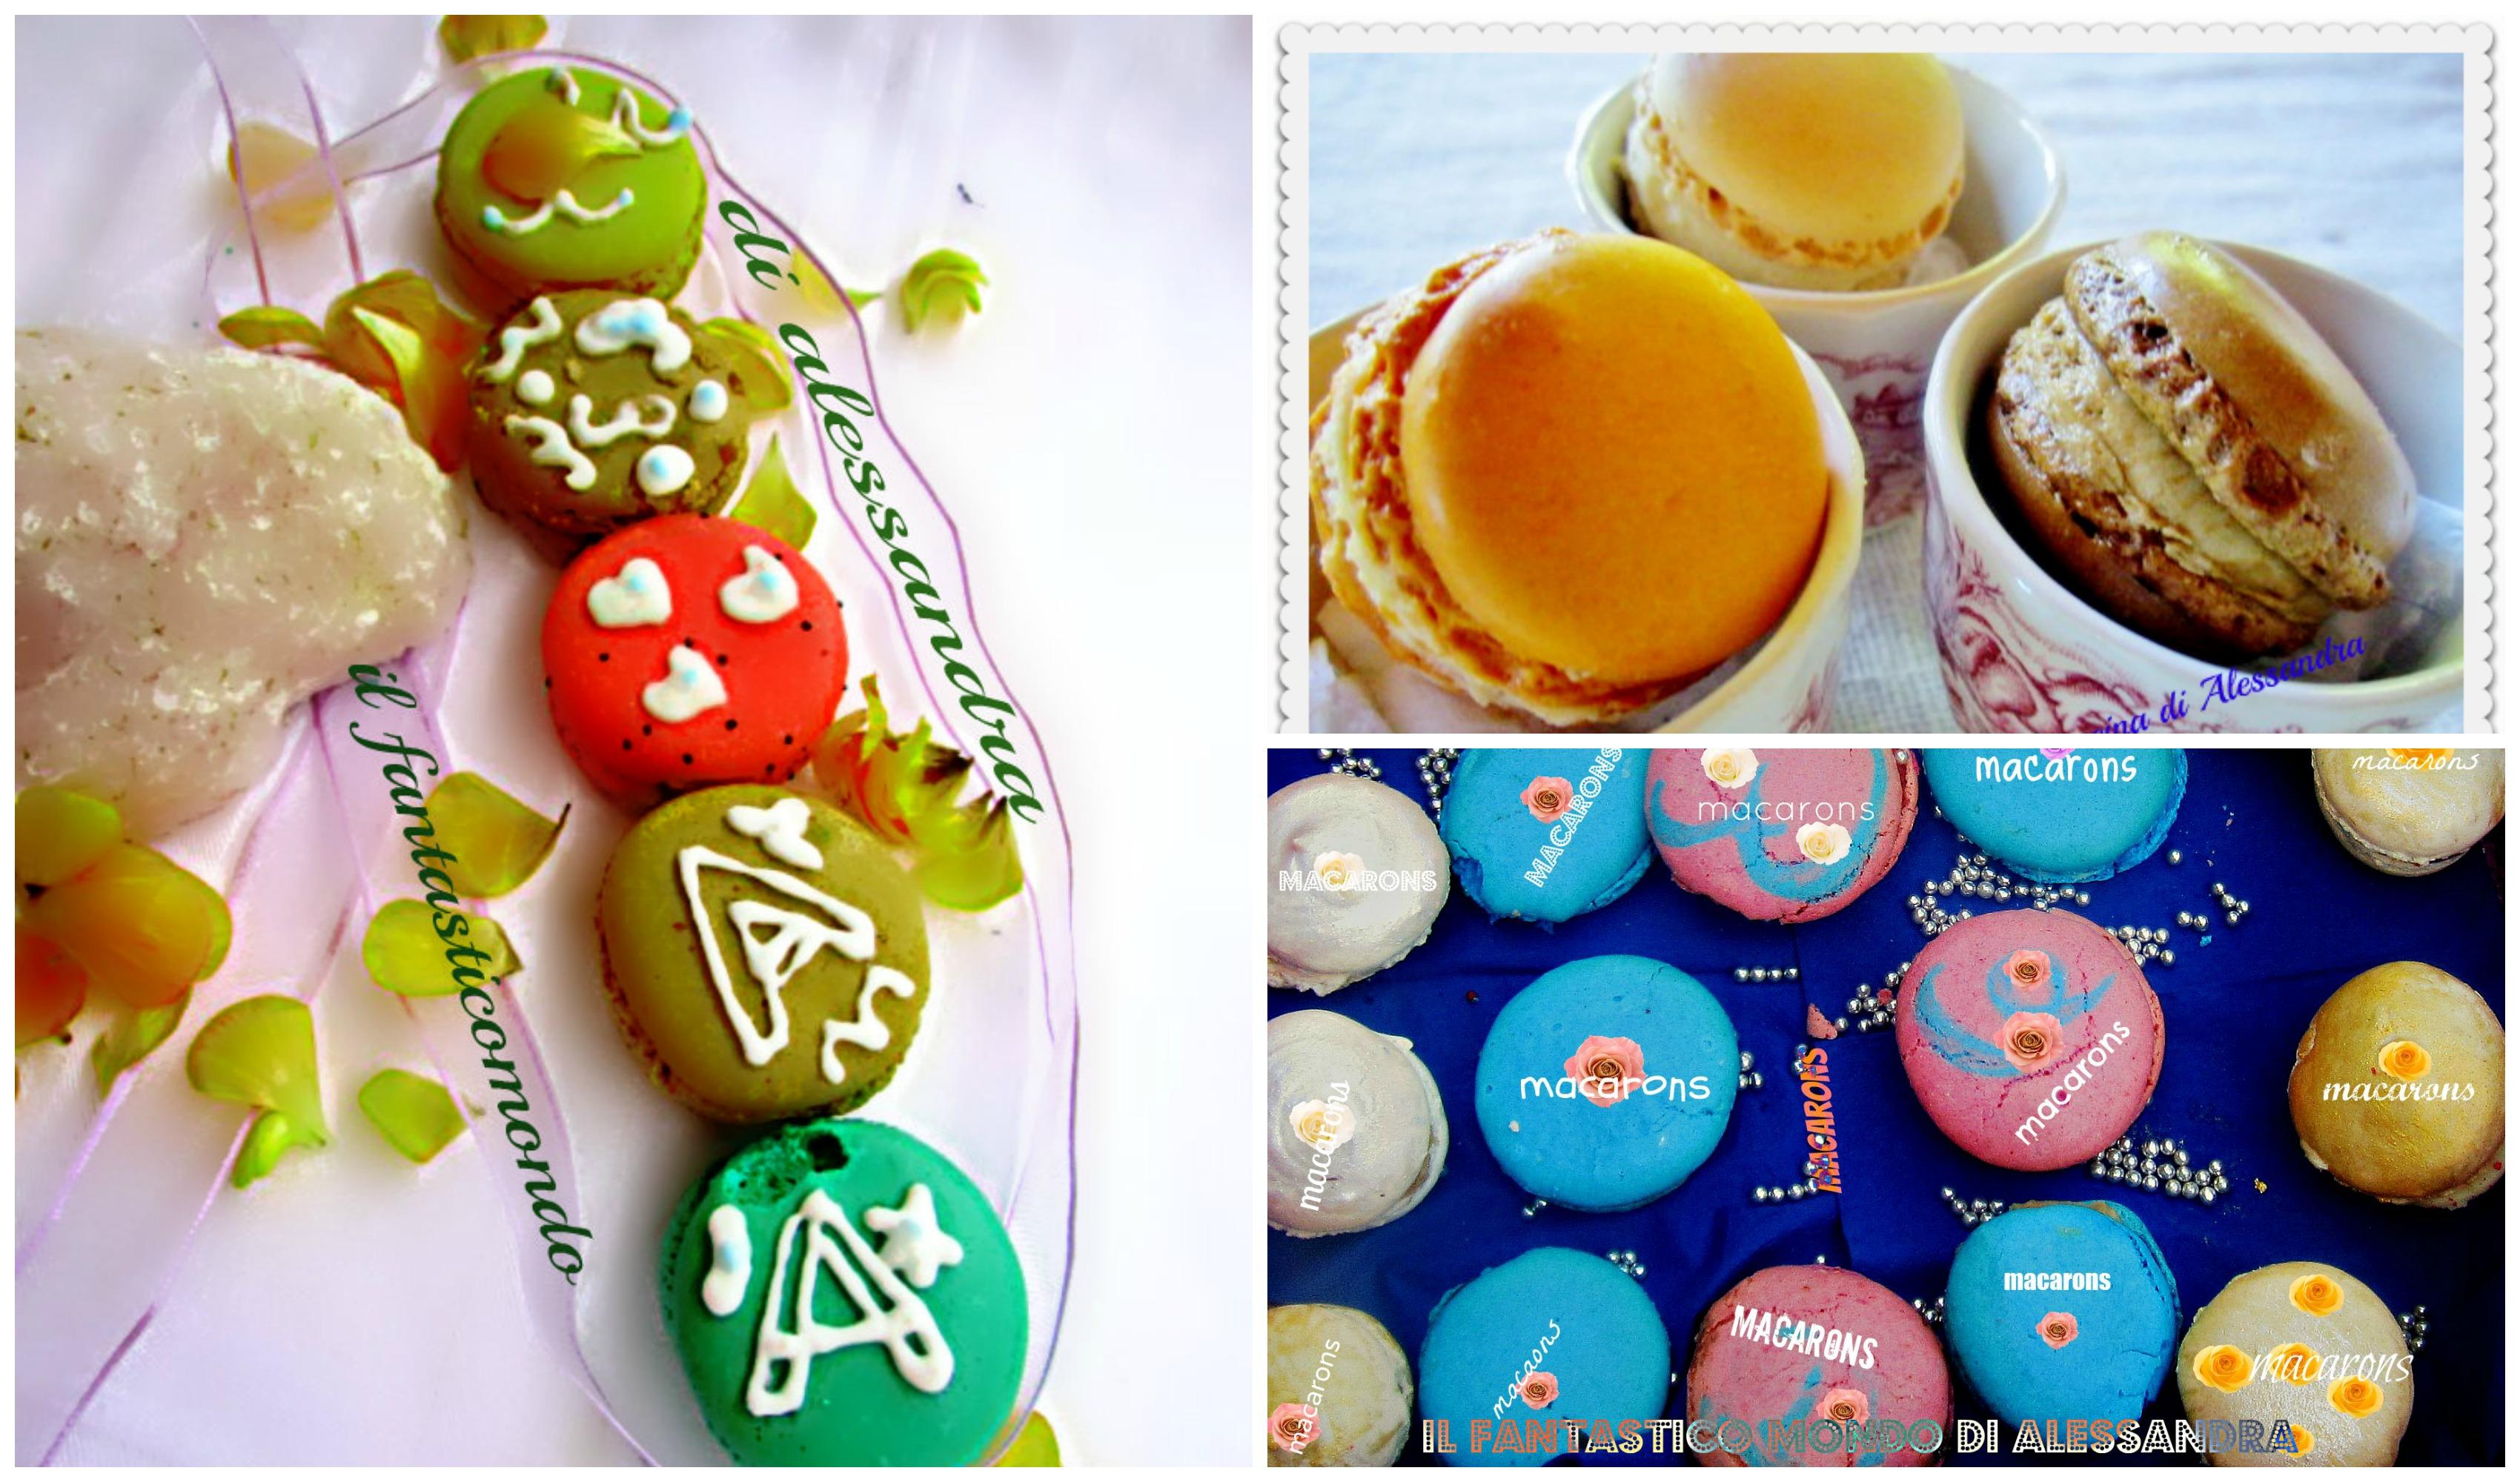 macarons dpf blog alessandra jpg